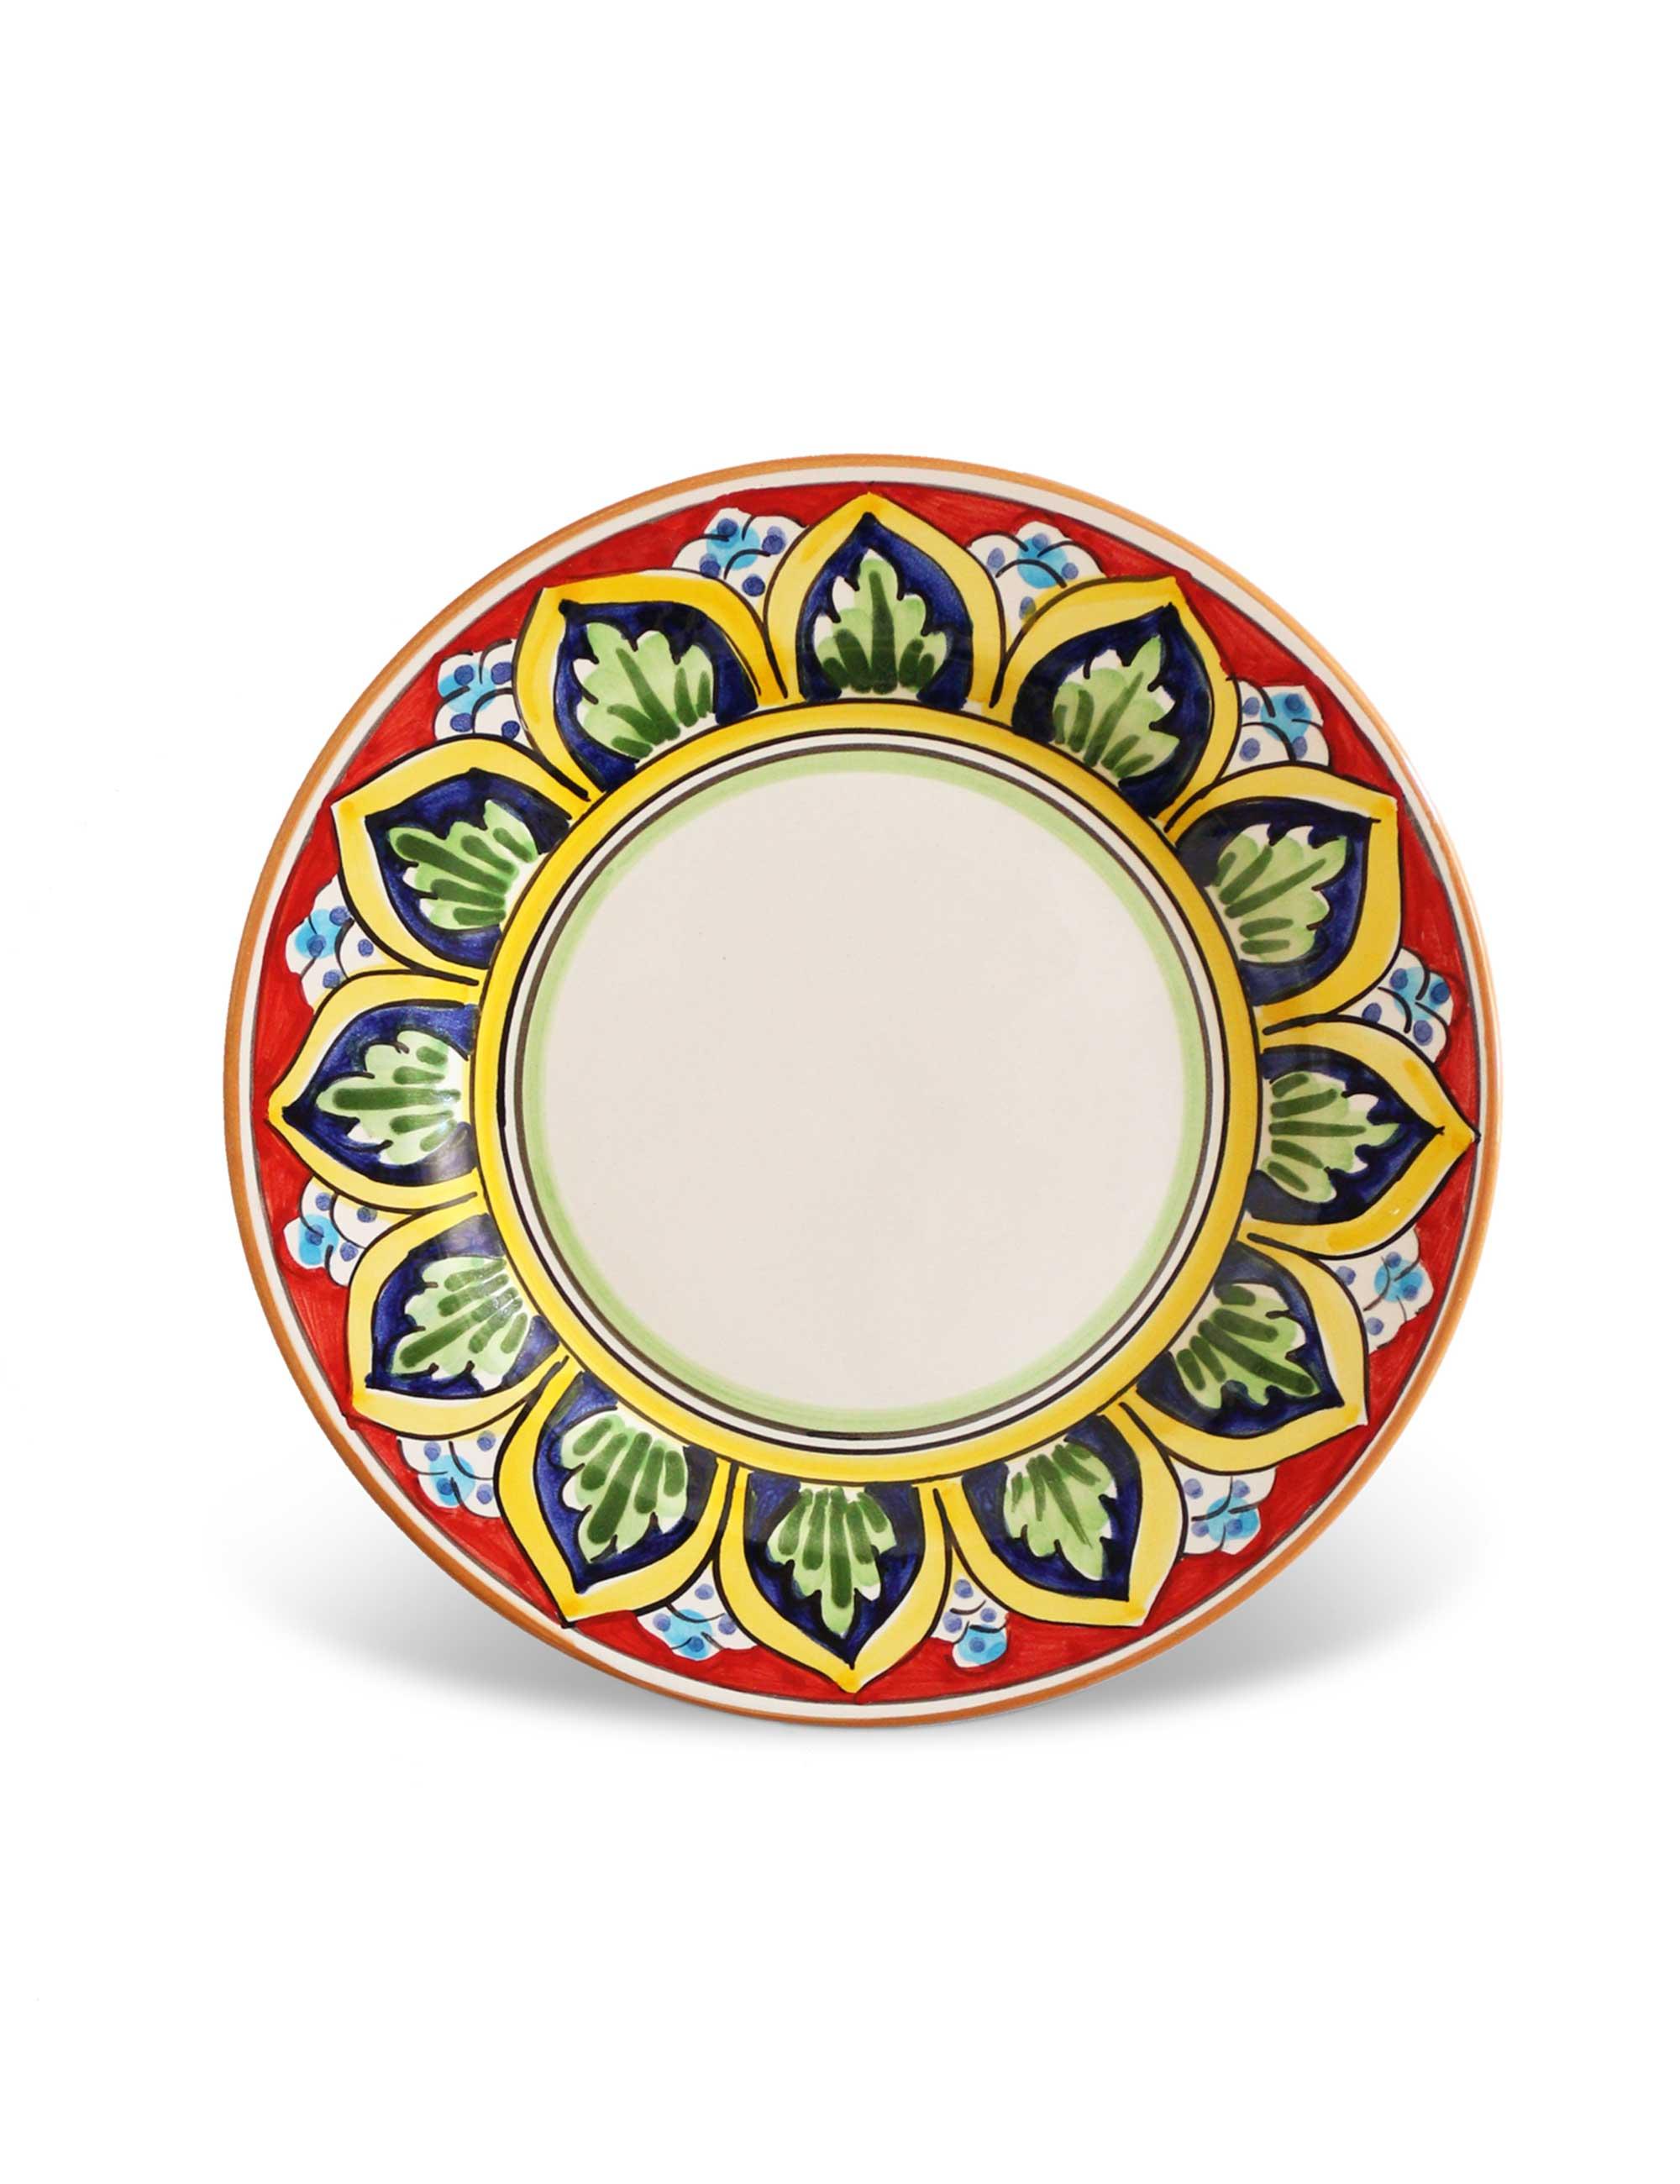 dessert plate sicilian ceramic vulcano  sc 1 st  Ceramiche Caltagirone Maremoro & DESSERT PLATE SICILIAN CERAMIC - VULCANO